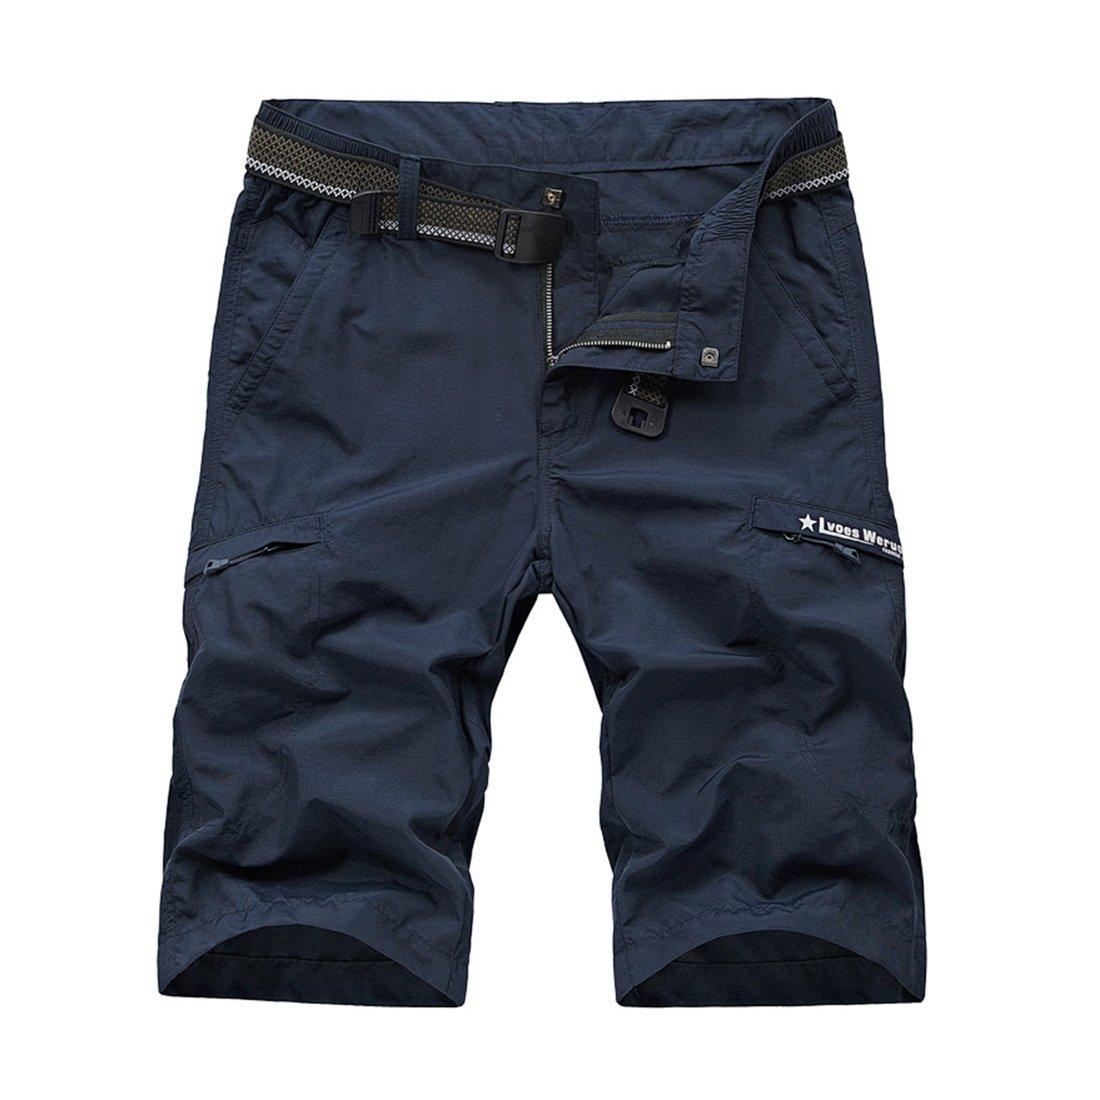 12 Inseam Mens Shorts Big and Tal 30 32 34 36 38 Khaki Grey Wine Red Army Green Dark Blue Slim Fit Summer Utility Pants